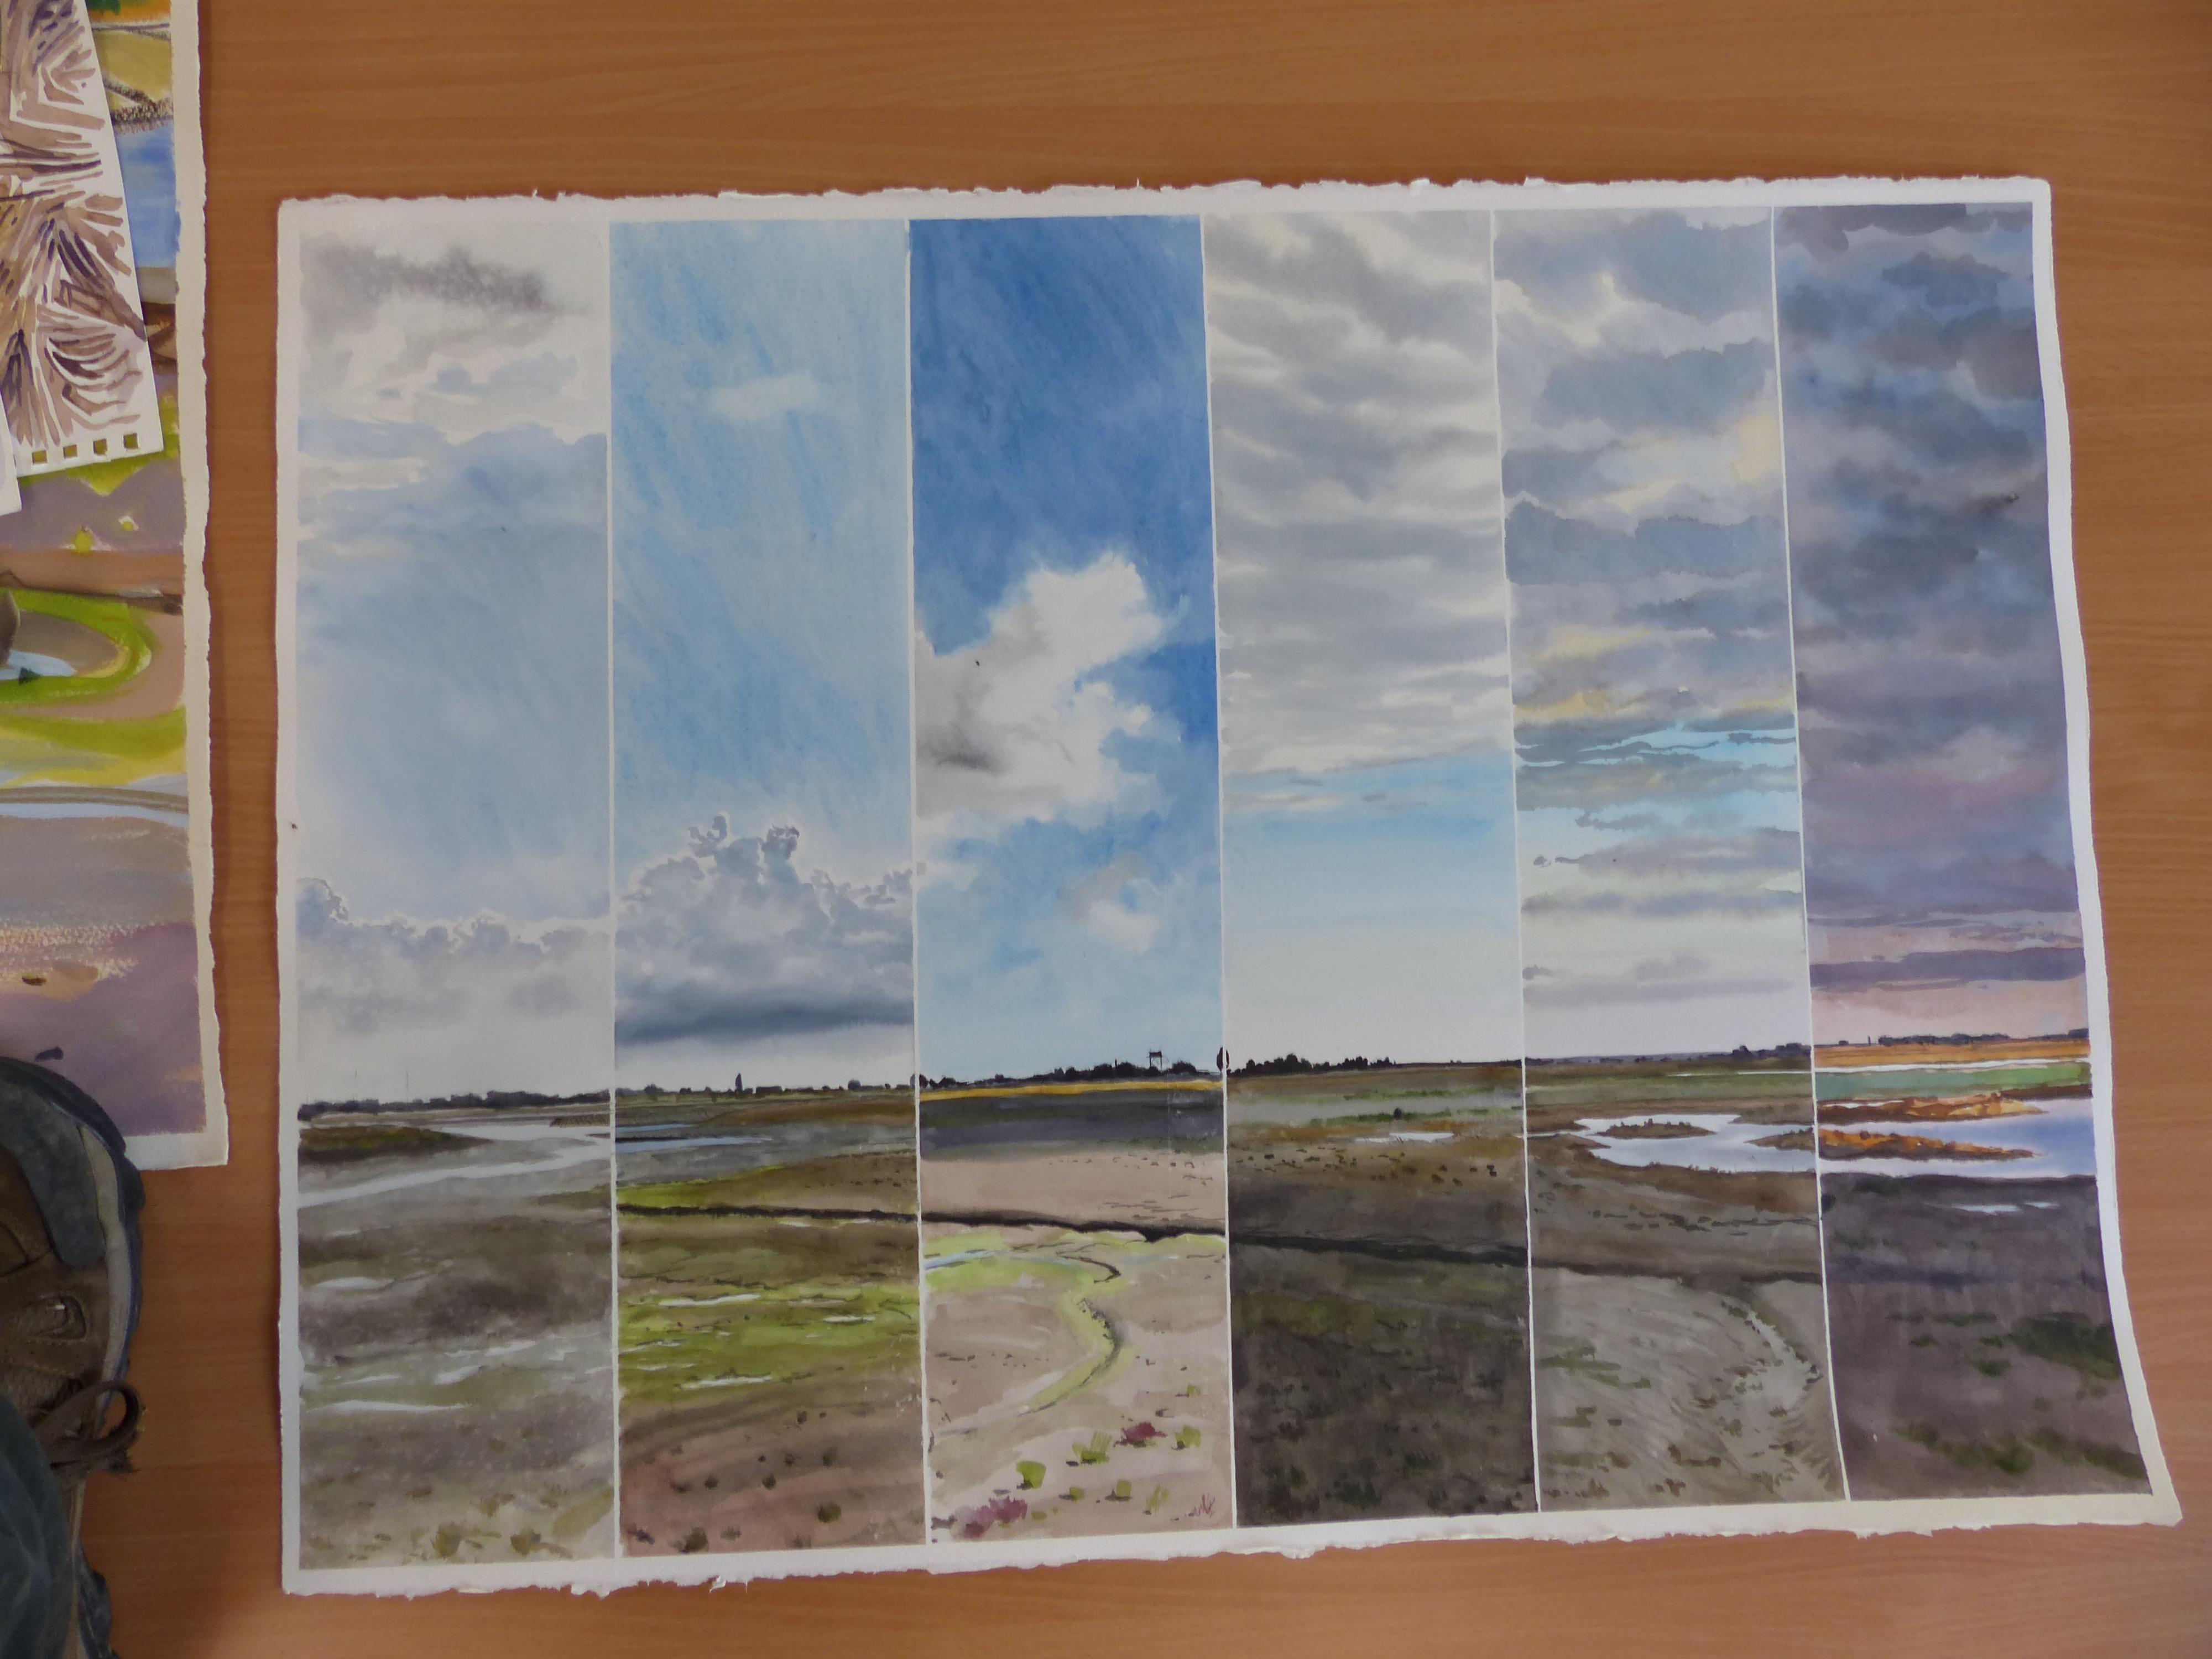 <p>Timed landscape by Ben Woodhams</p>